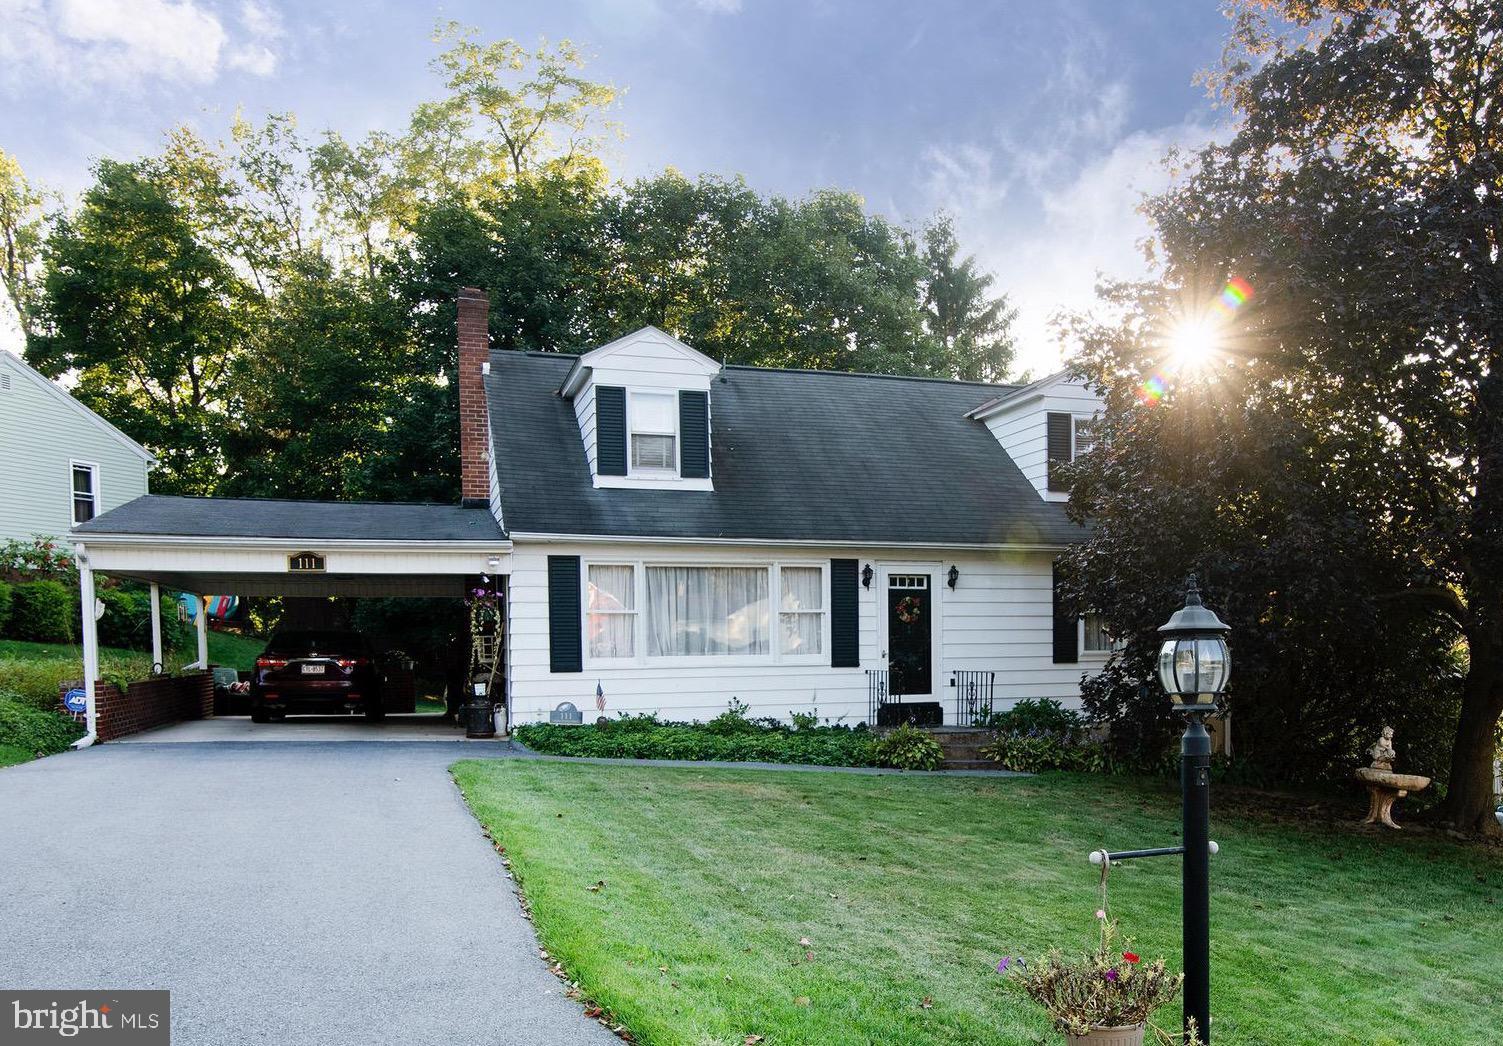 Find Homes for Sale in Pottsville, Greater Philadelphia